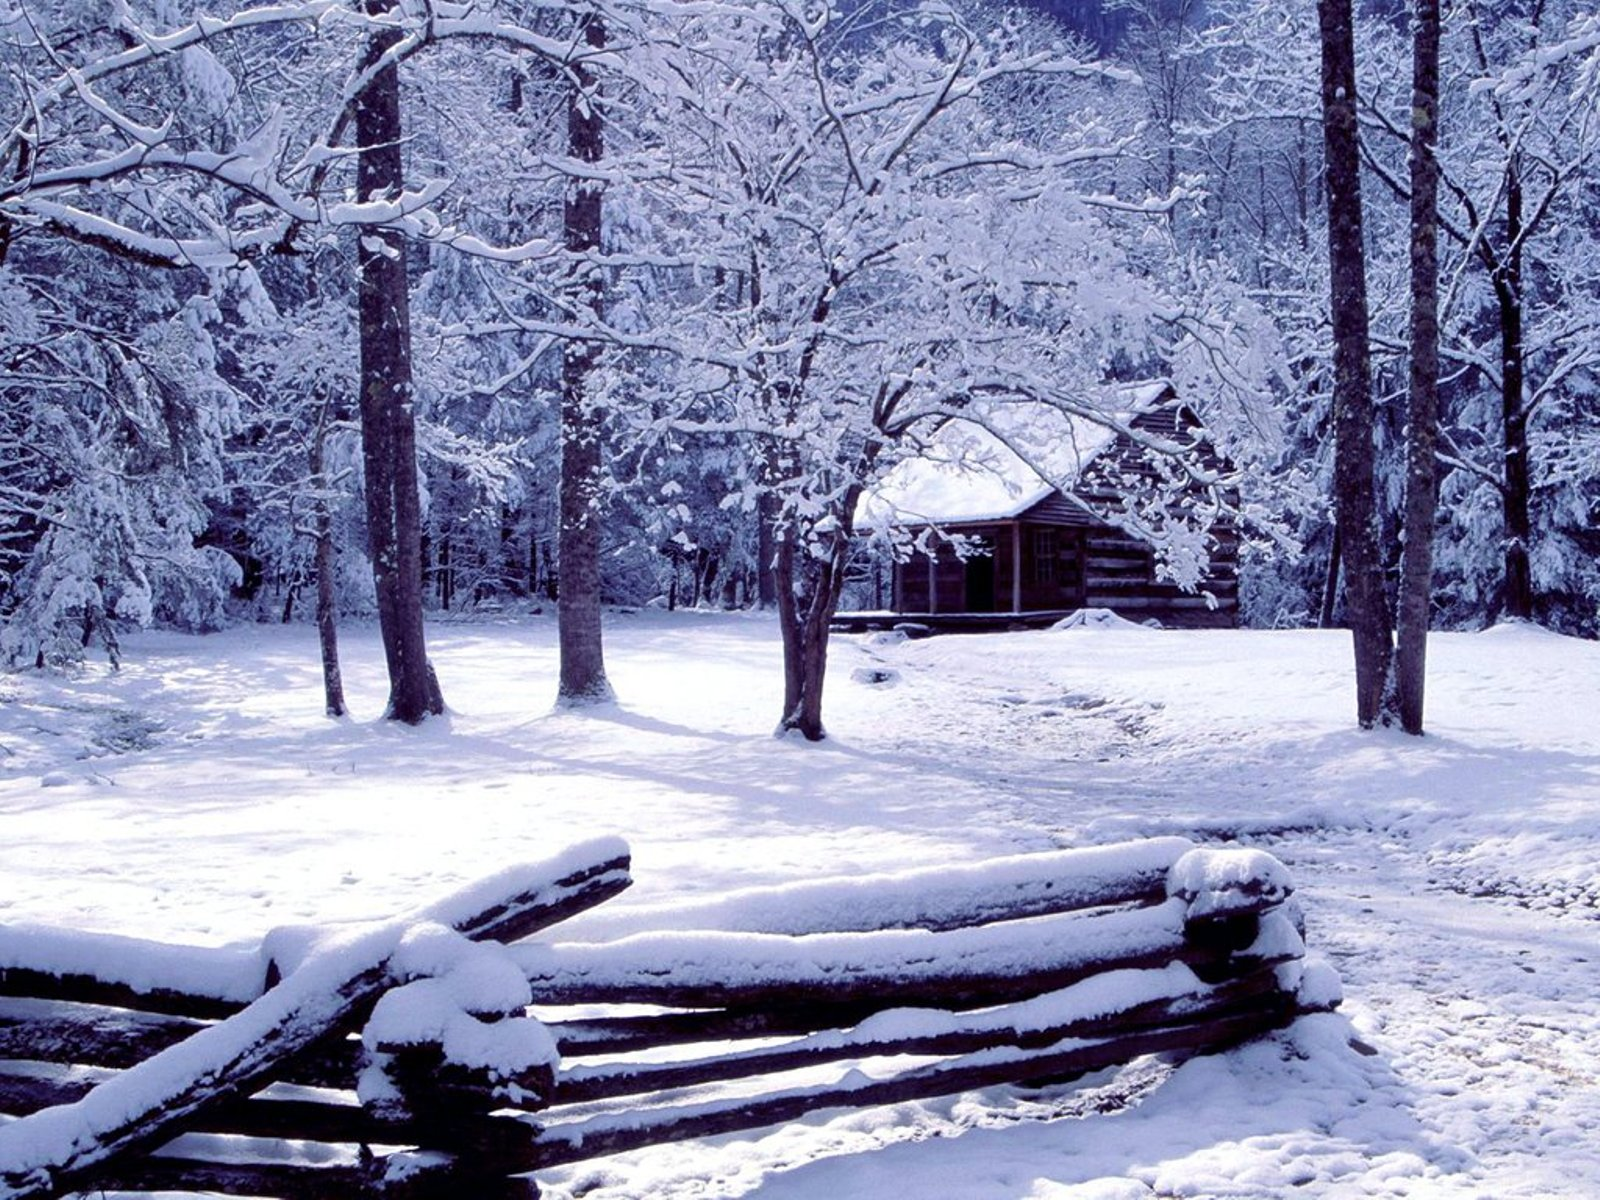 Wallpapers Winter Scenery 1600x1200